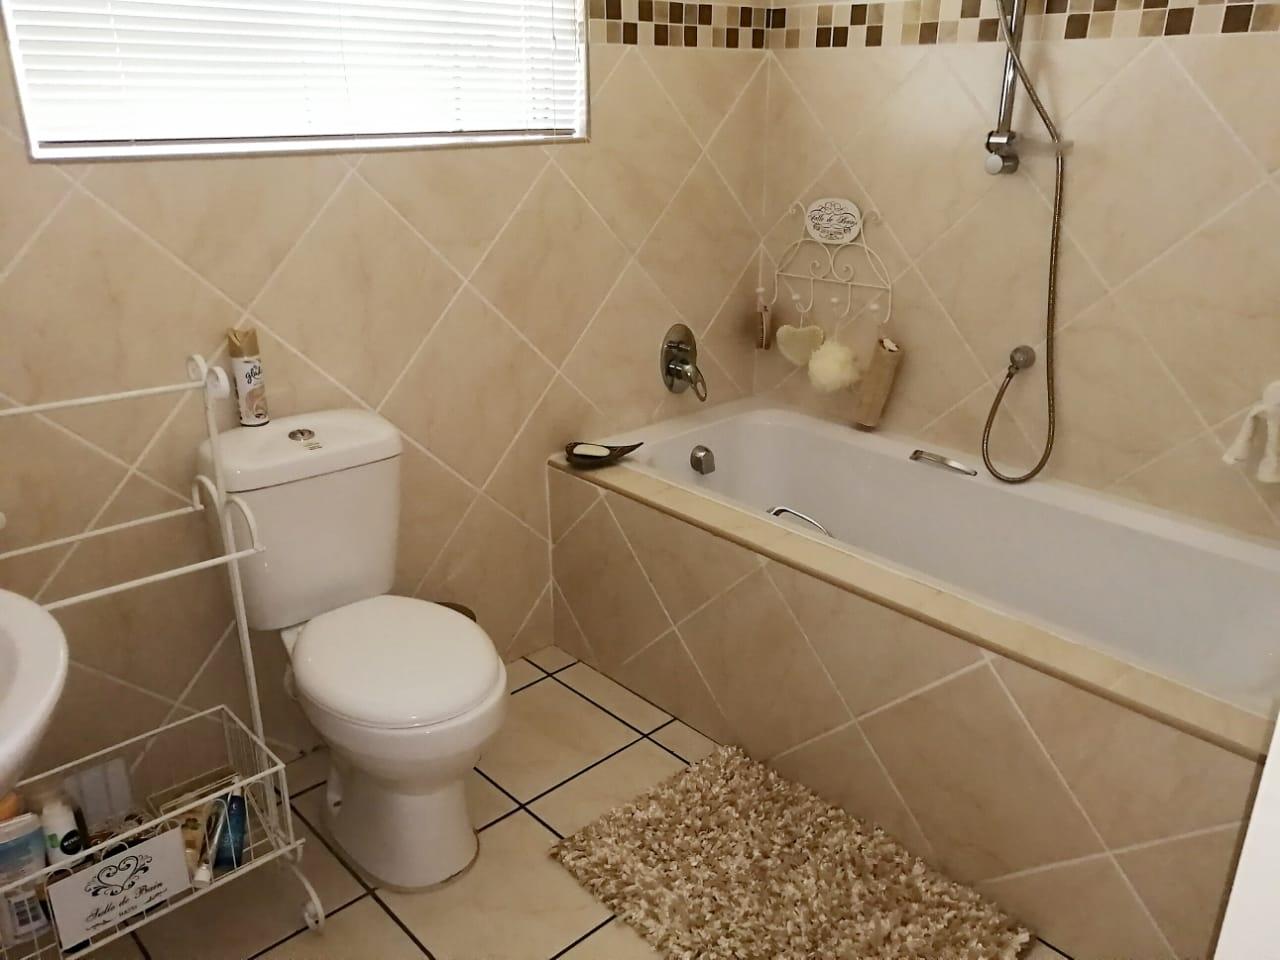 Bathroom showing bath, toilet and wash basin